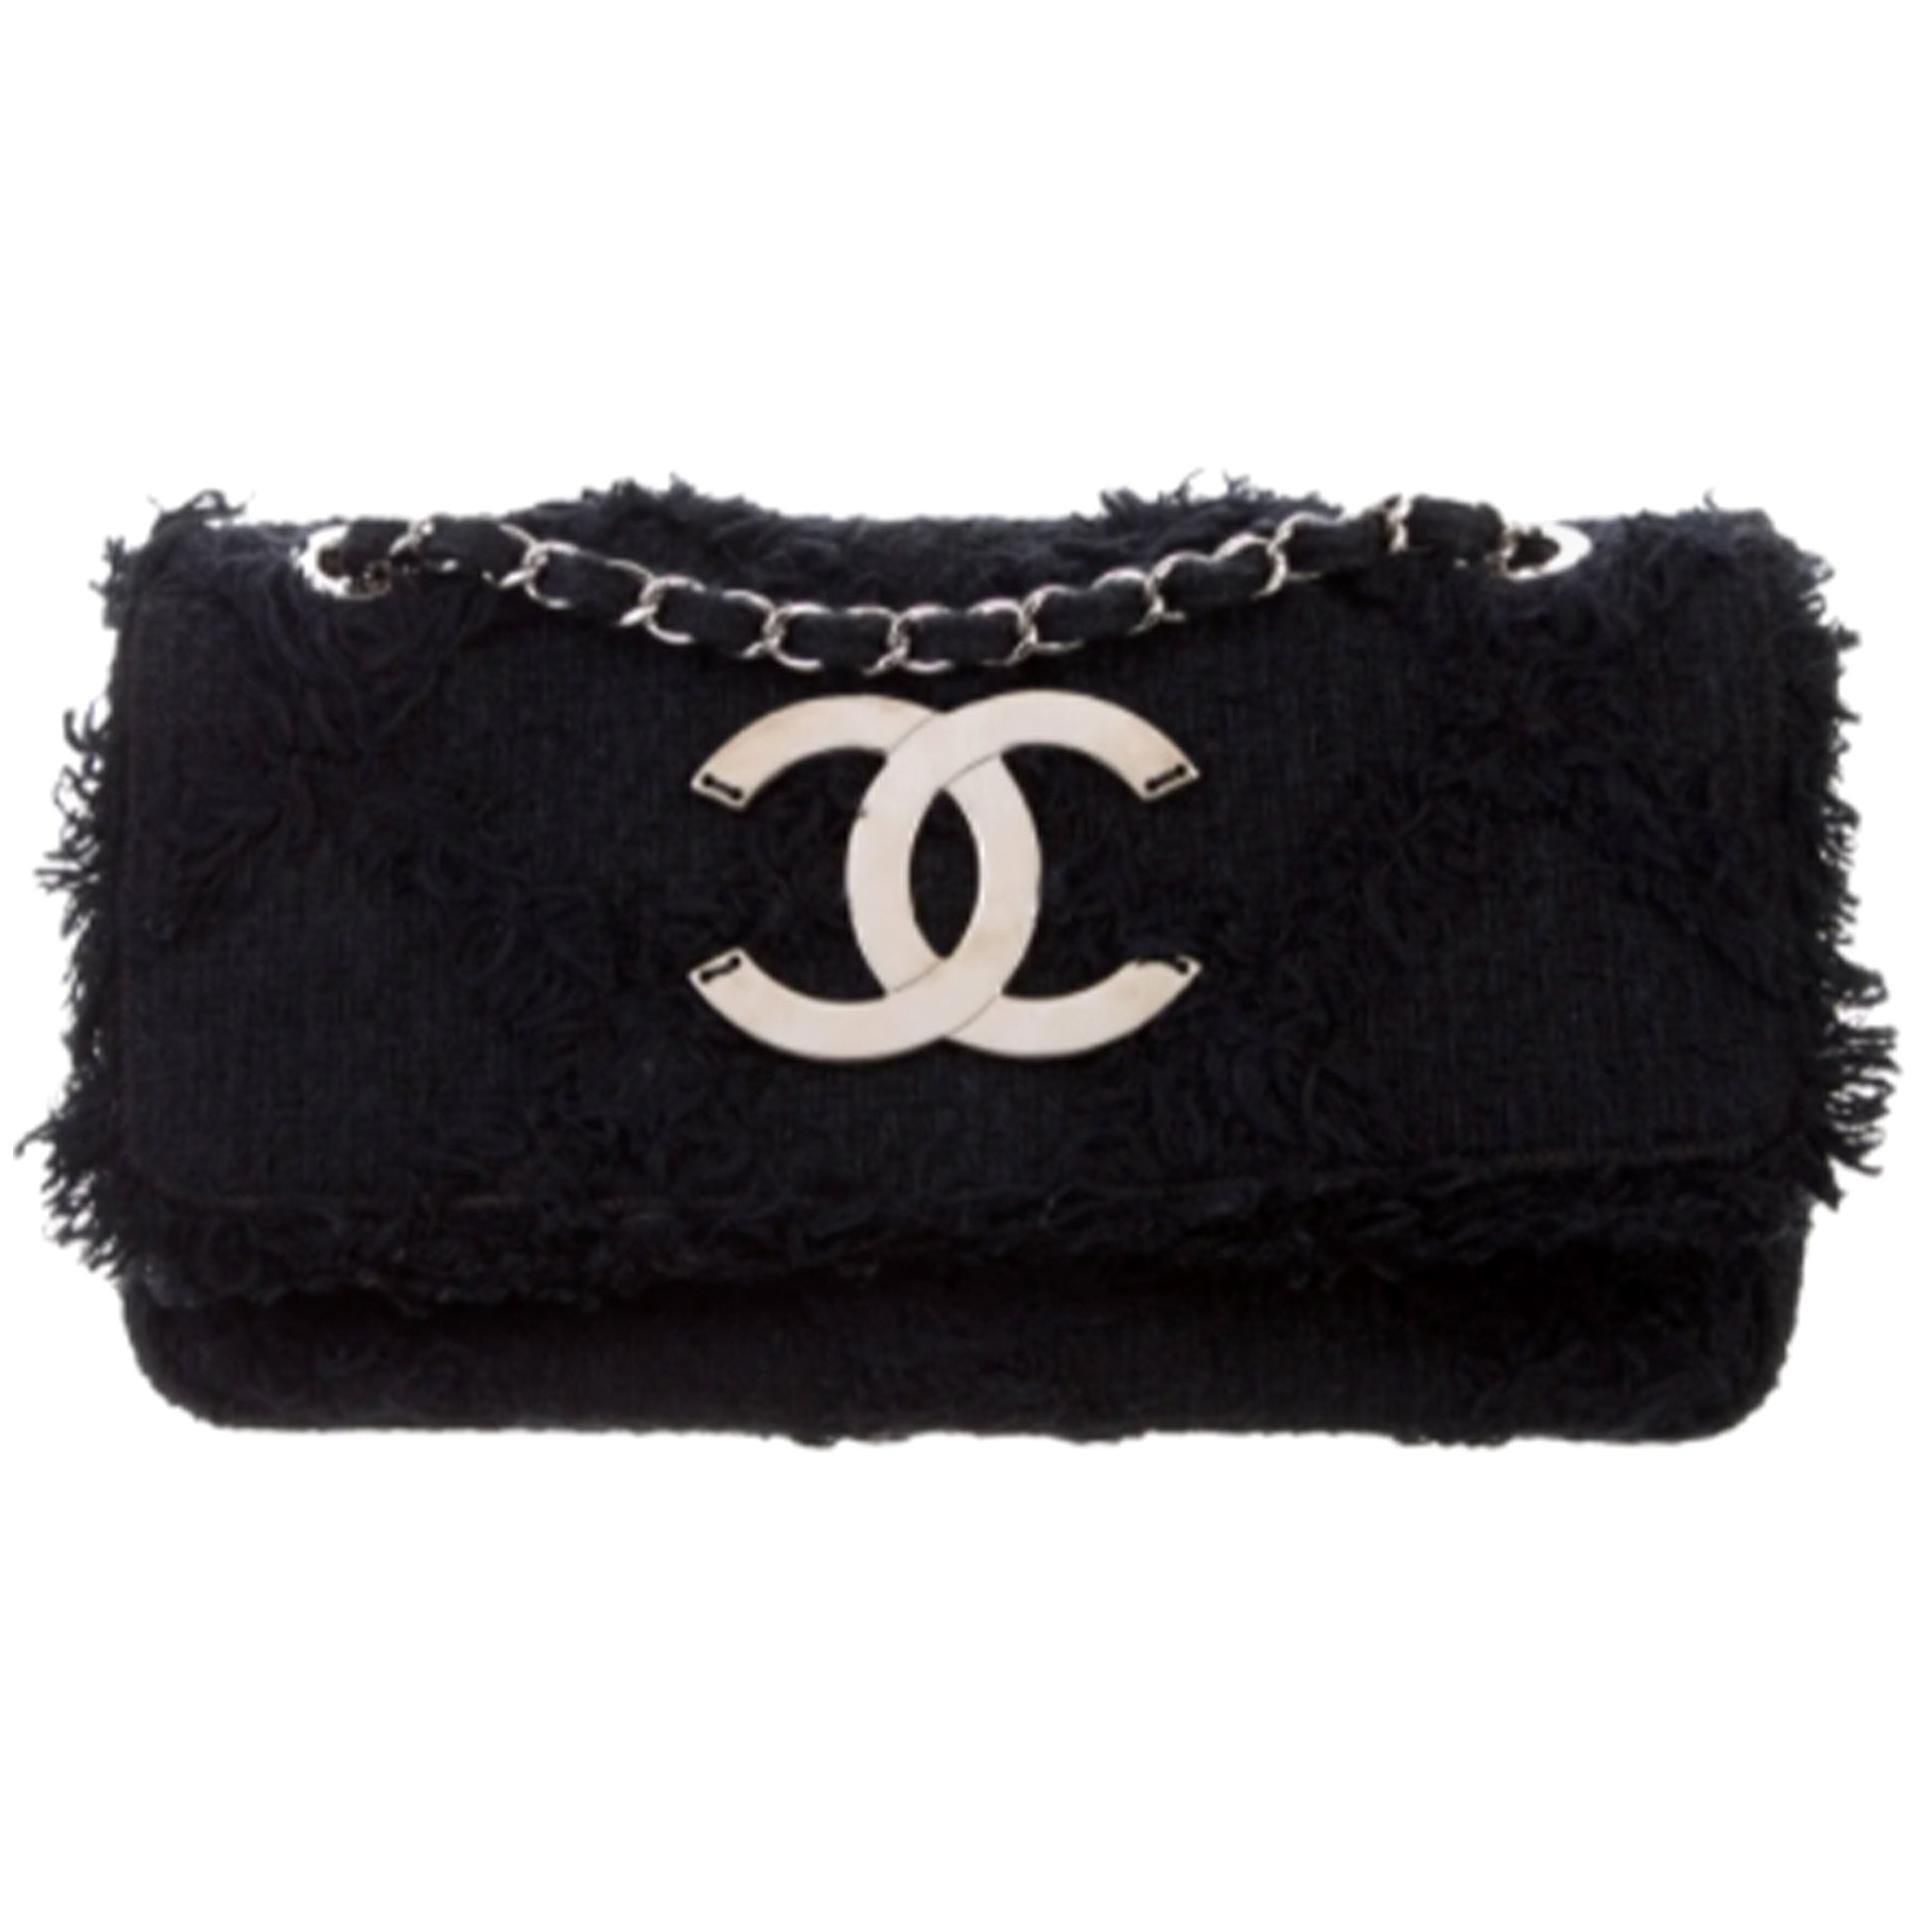 Chanel Small Black Tweed Crochet Fringe Nature Organic Flap Bag